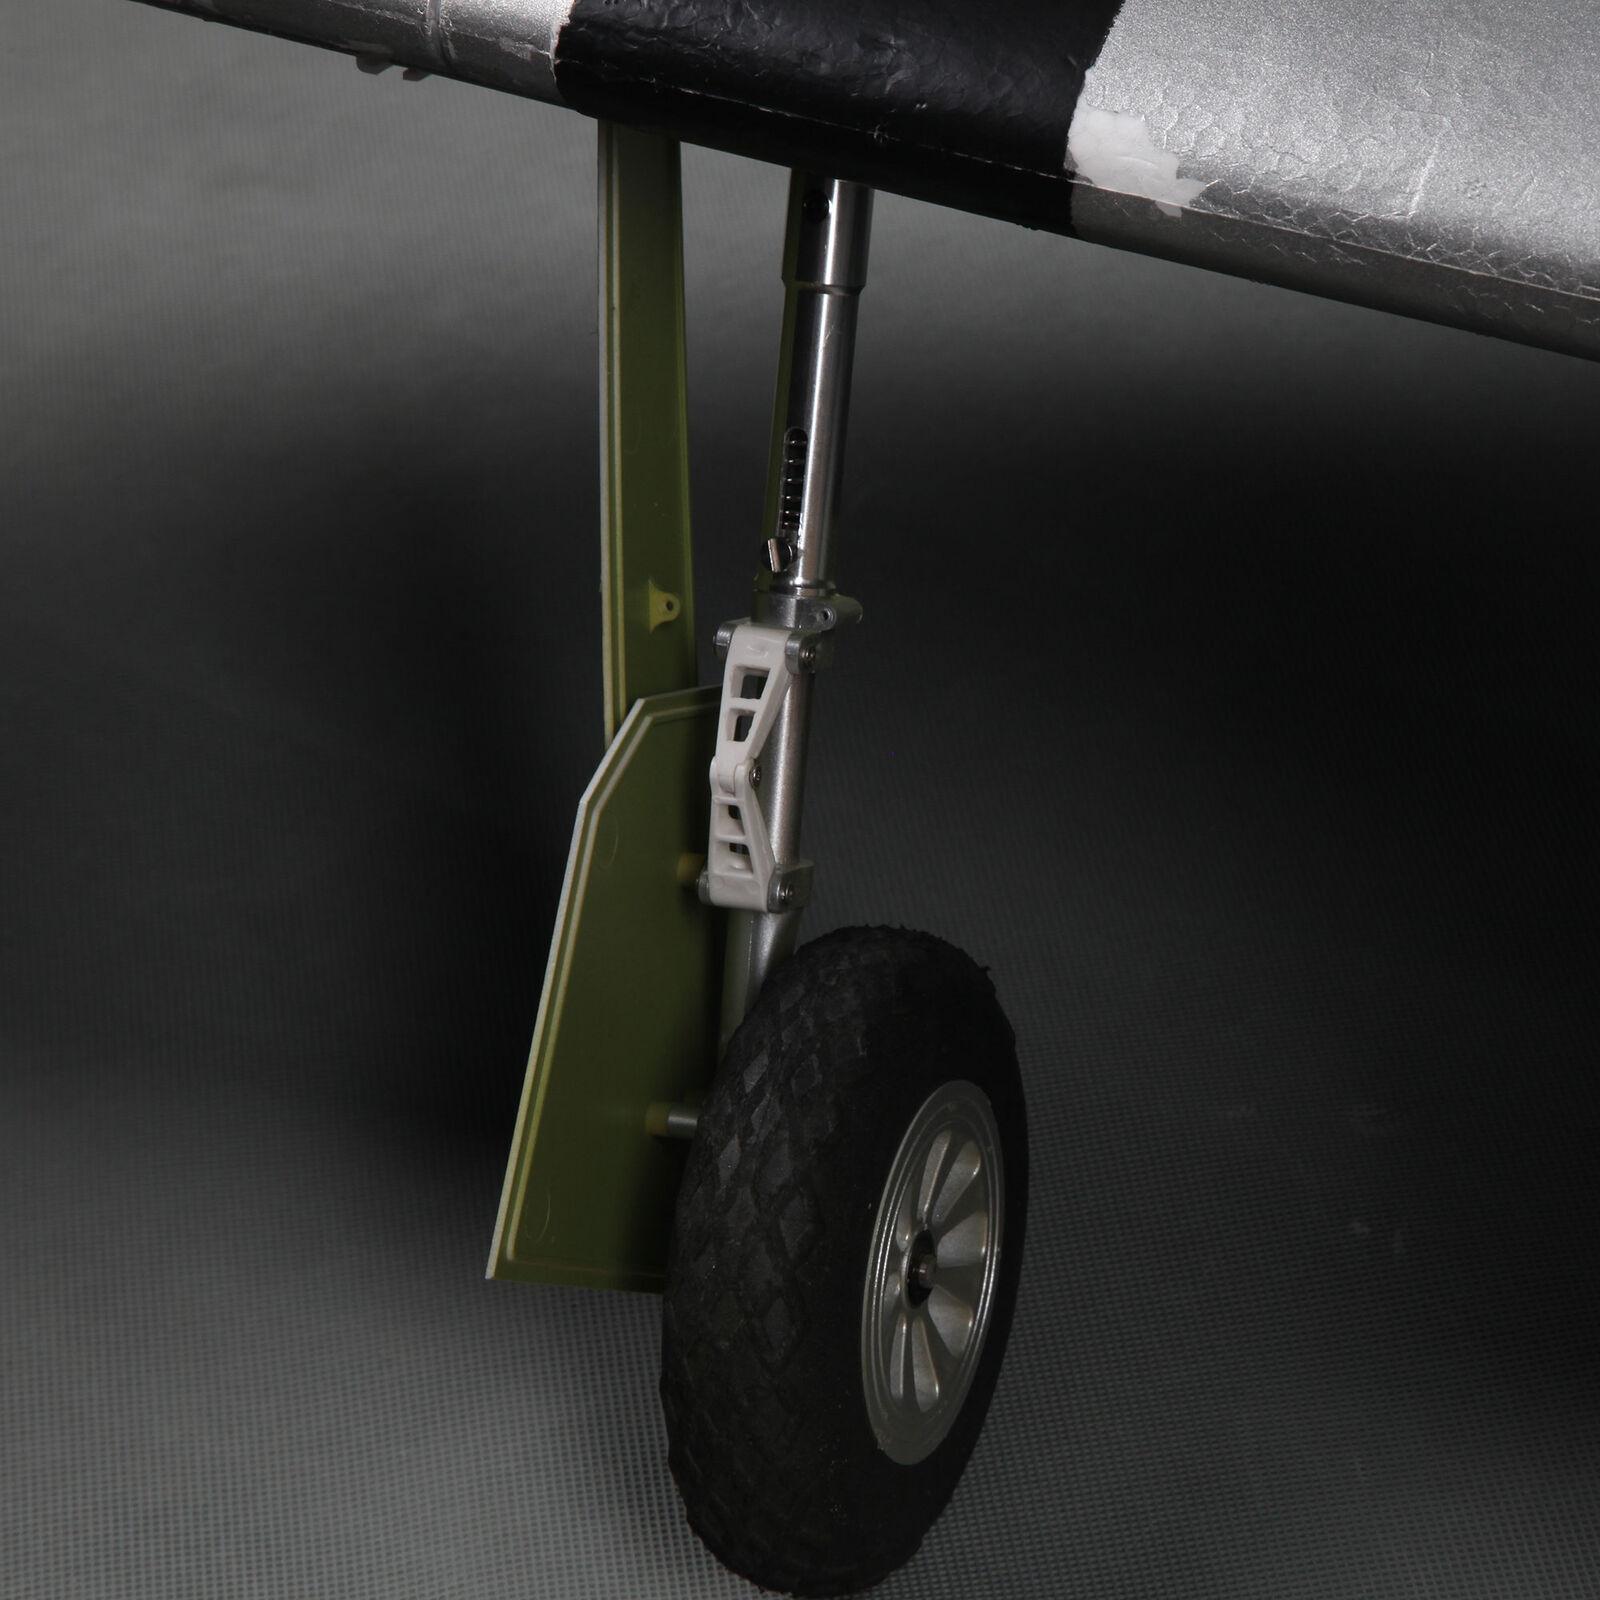 P-47 Razorback Bonnie PNP, 1500mm